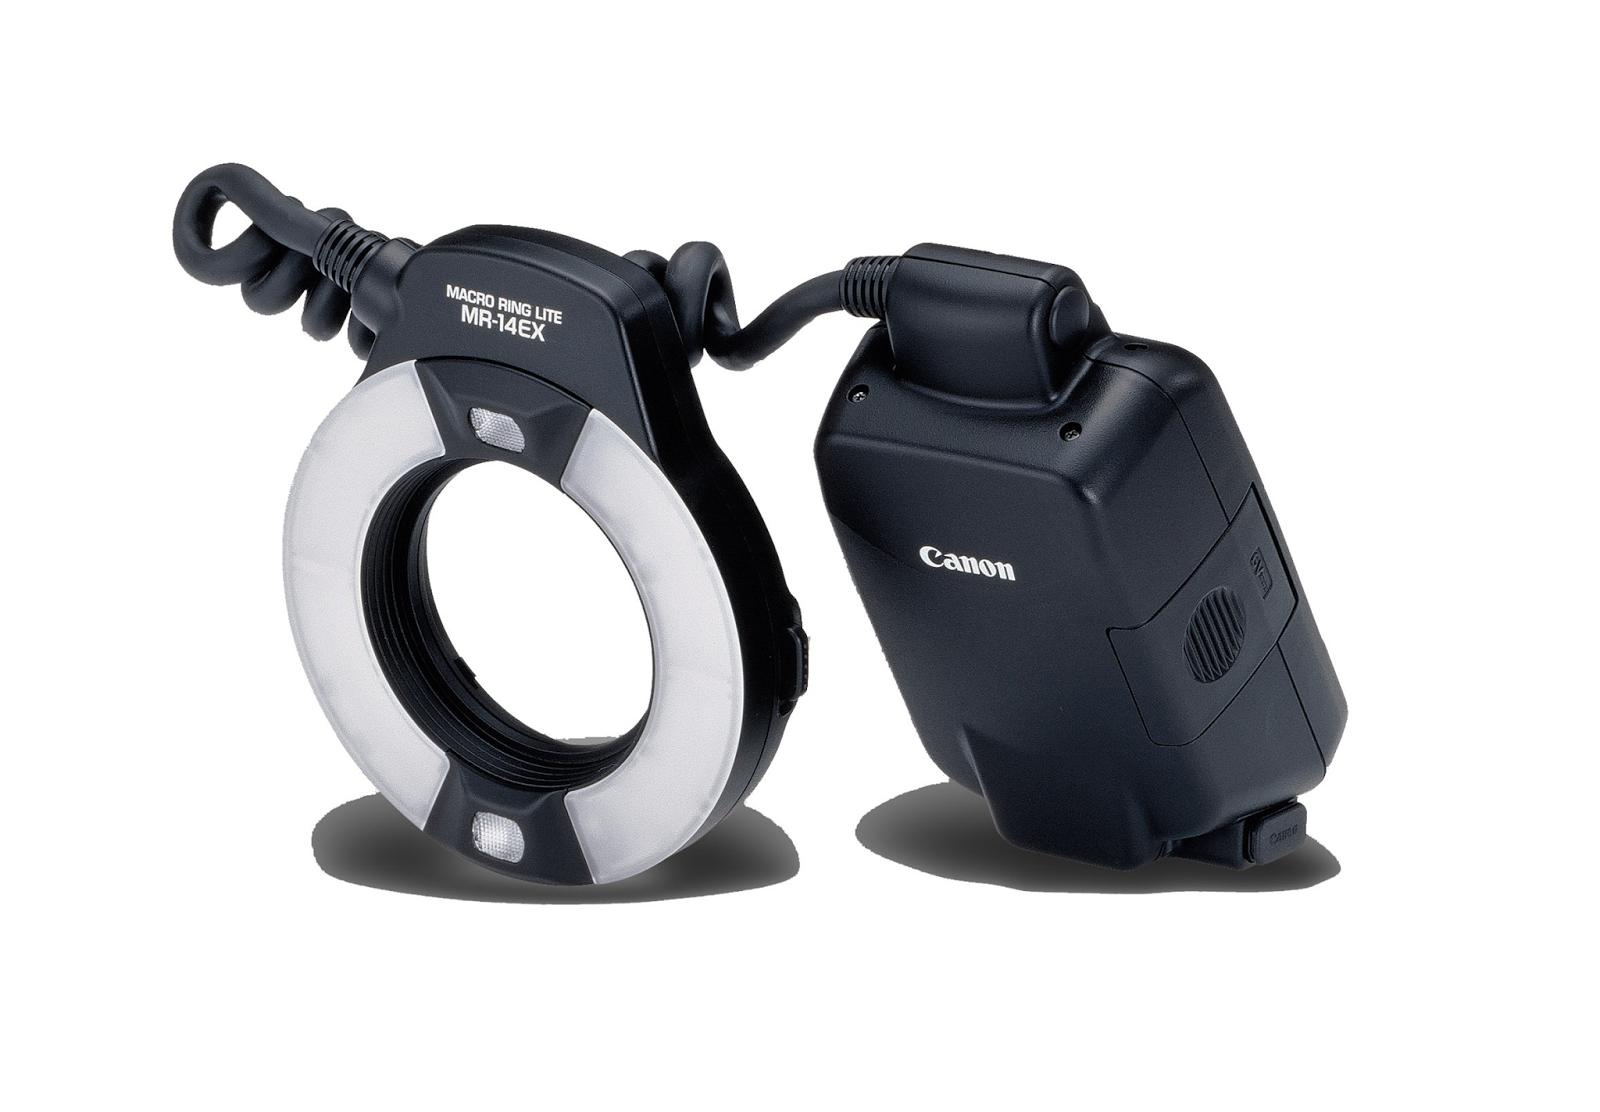 Canon Speedlite Macro Ring Lite MR-14EX II Flash